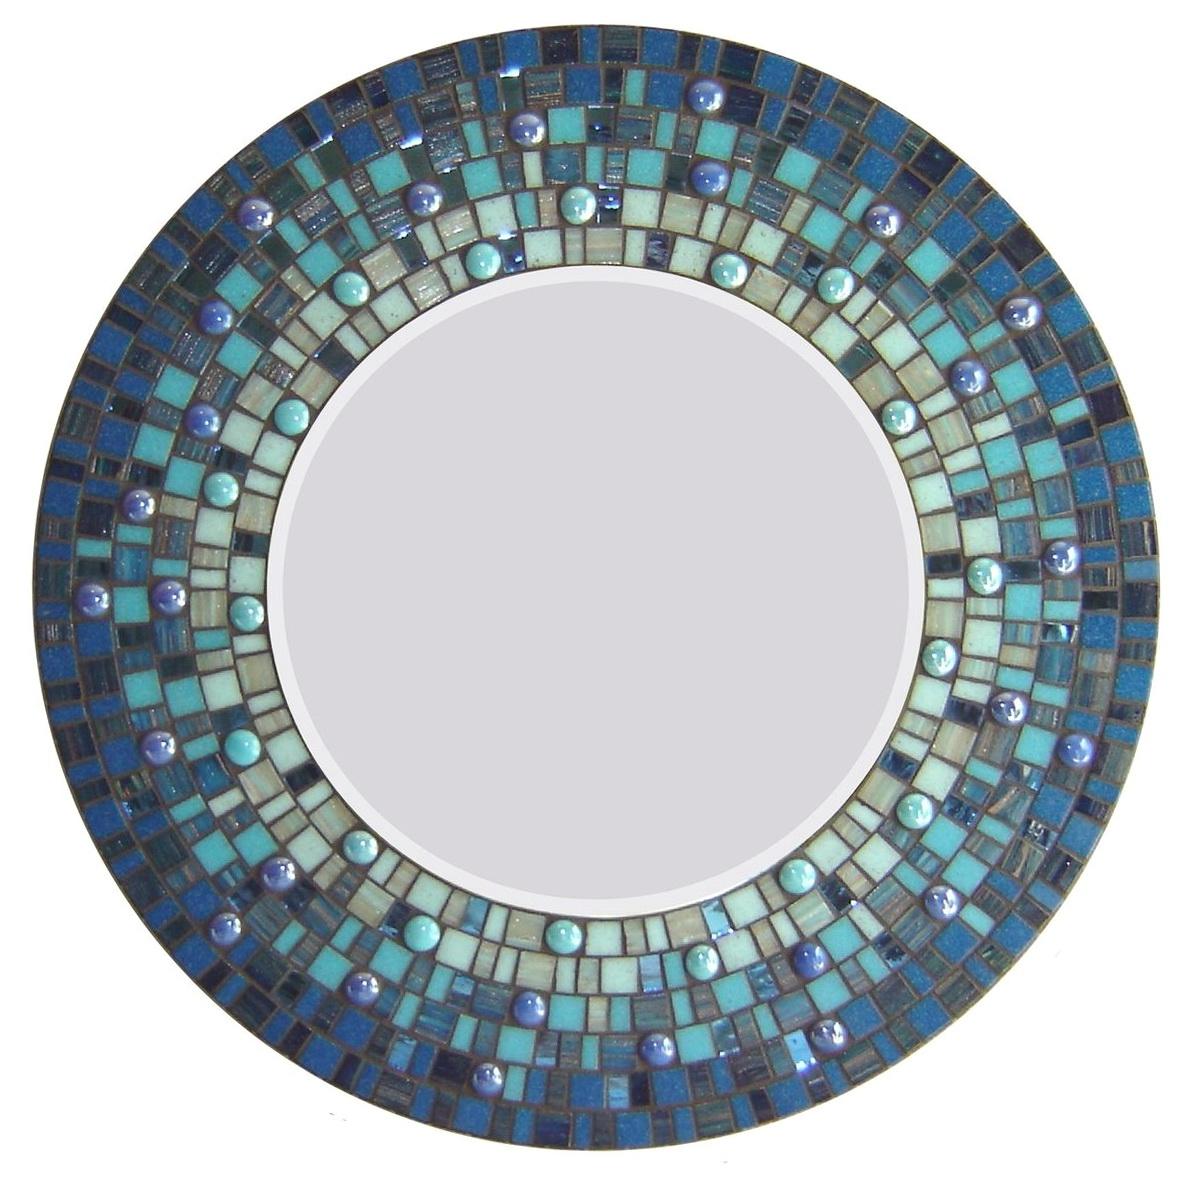 Mosaic Mirror Wall Art